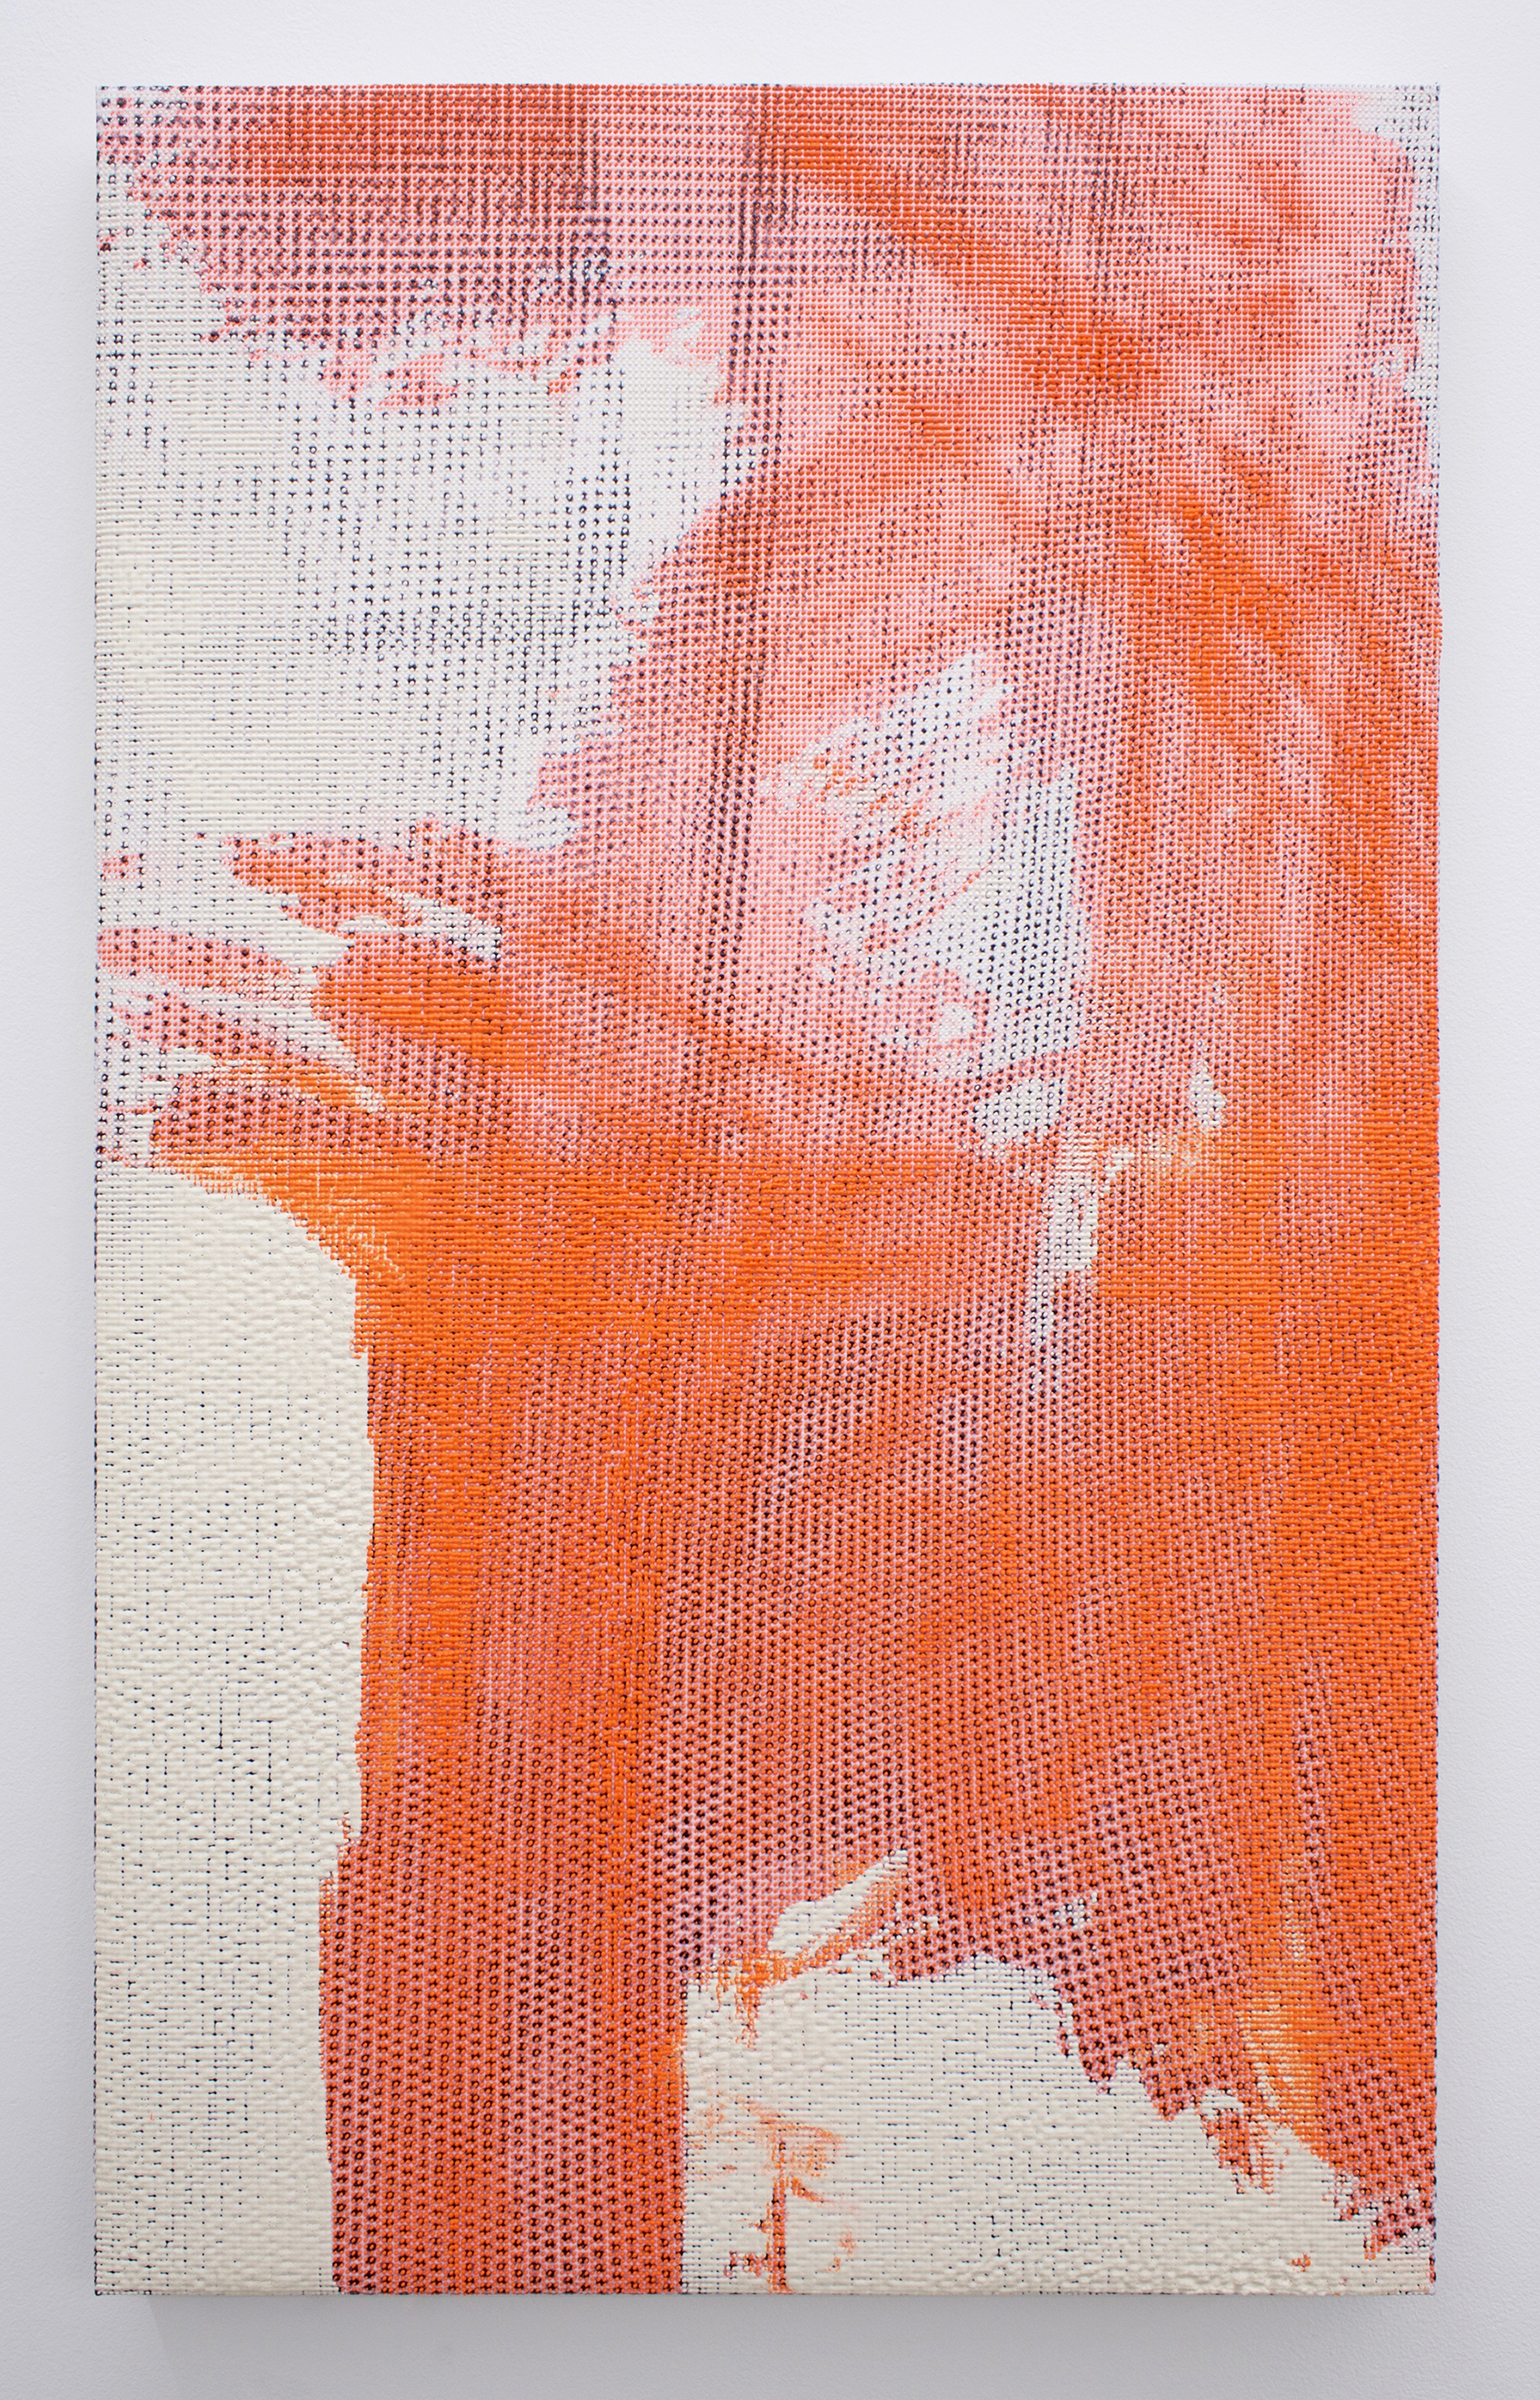 "EVAN NESBIT  Manifold Painting (Superstratum #8) , 2017, acrylic, UV curable ink on vinyl coated mesh fabric, 30"" x 18"""